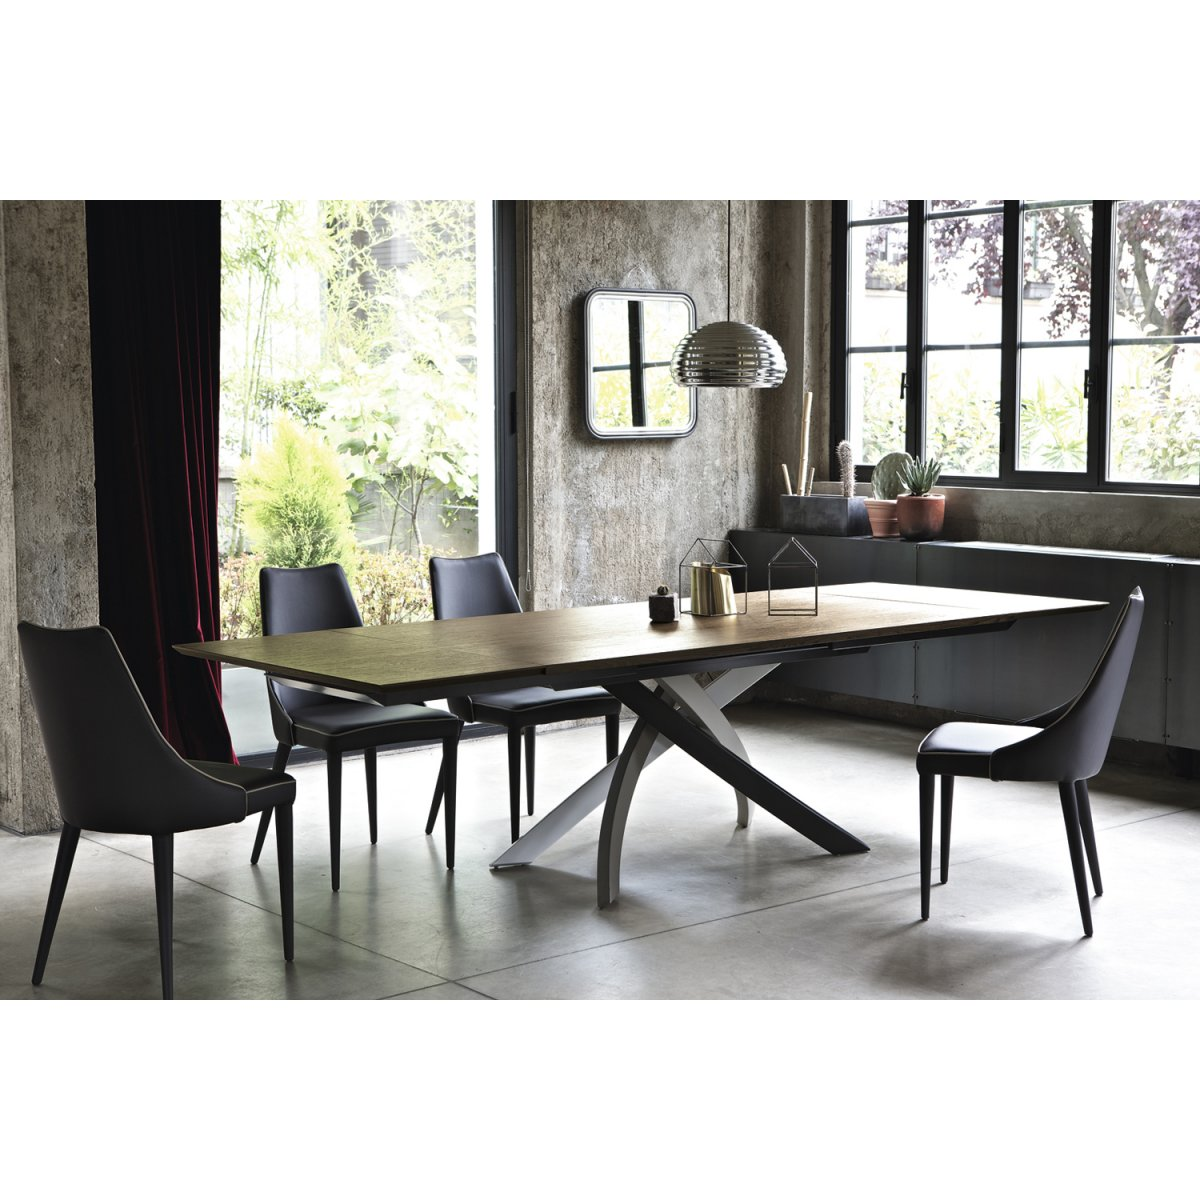 Bontempi Casa Artistico Ausziehbarer Tisch 160x90 Holz Bontempi